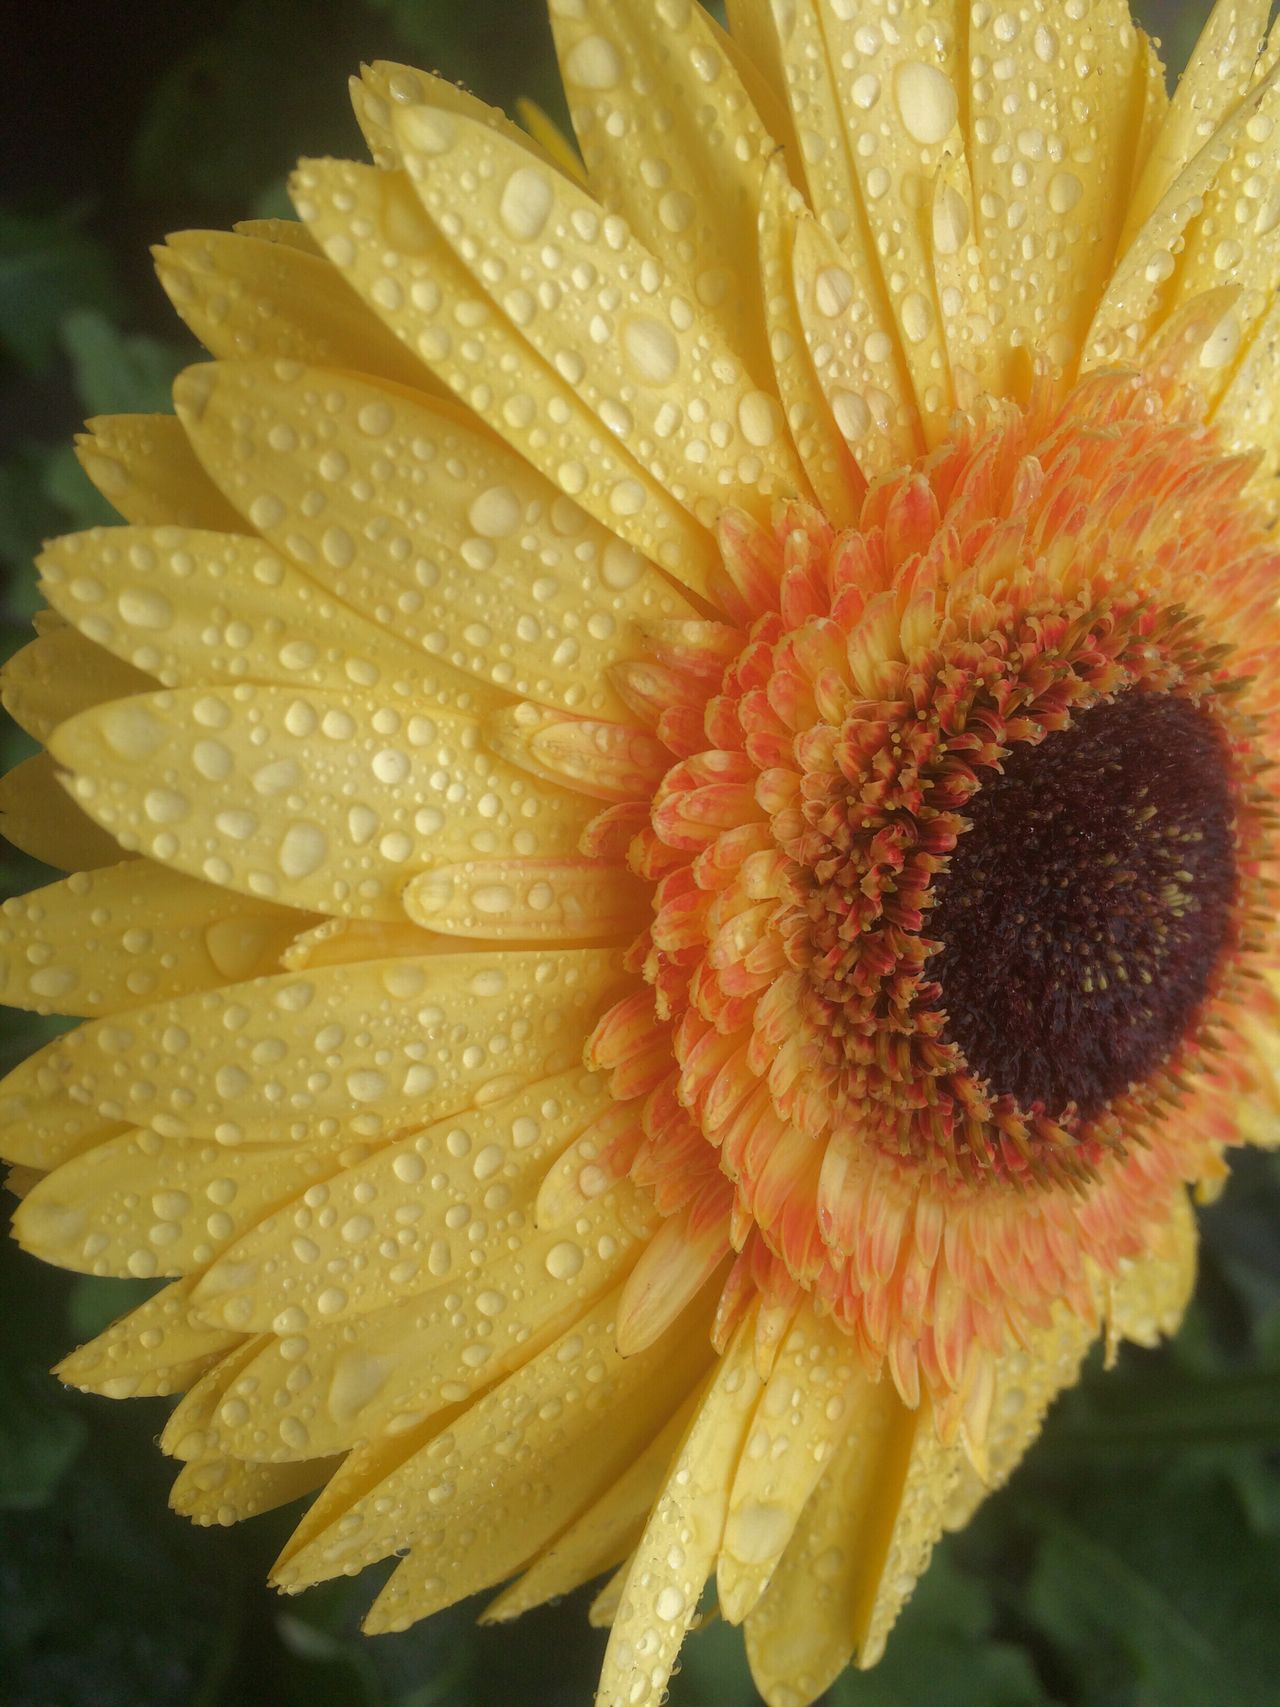 Gerberdaisy Daisy Flower